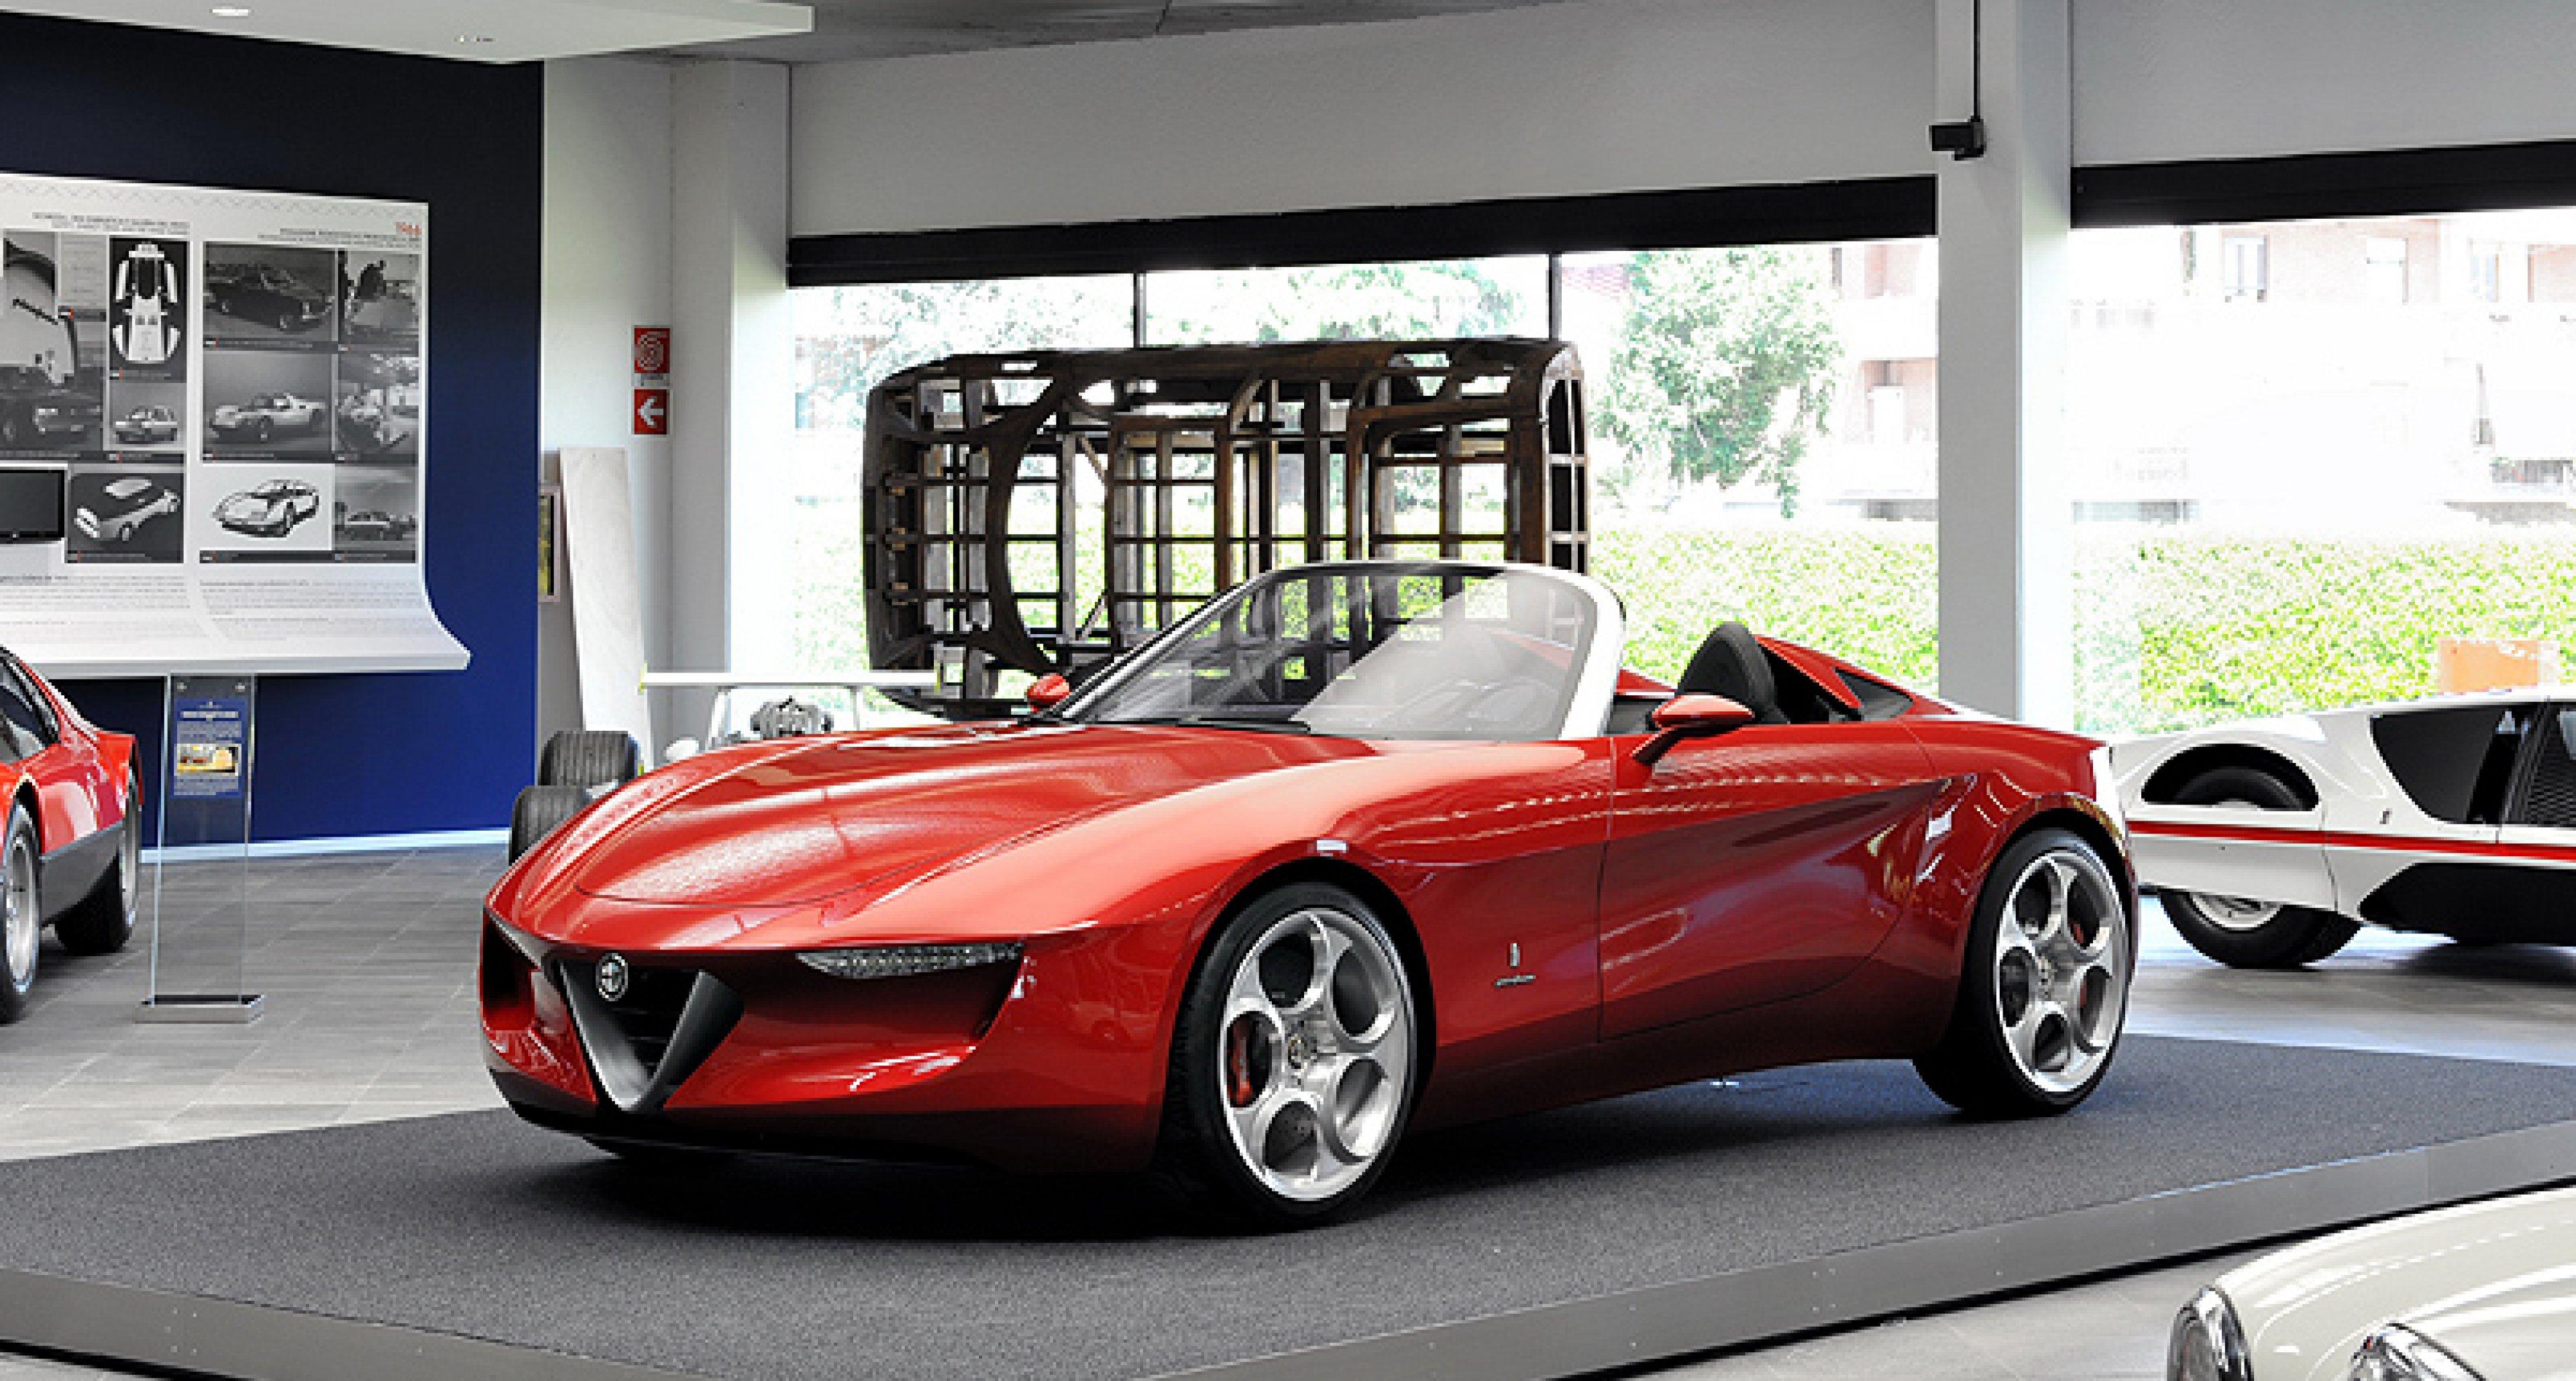 Pininfarina Collection: from Cisitalia 202 to 2uettottanta